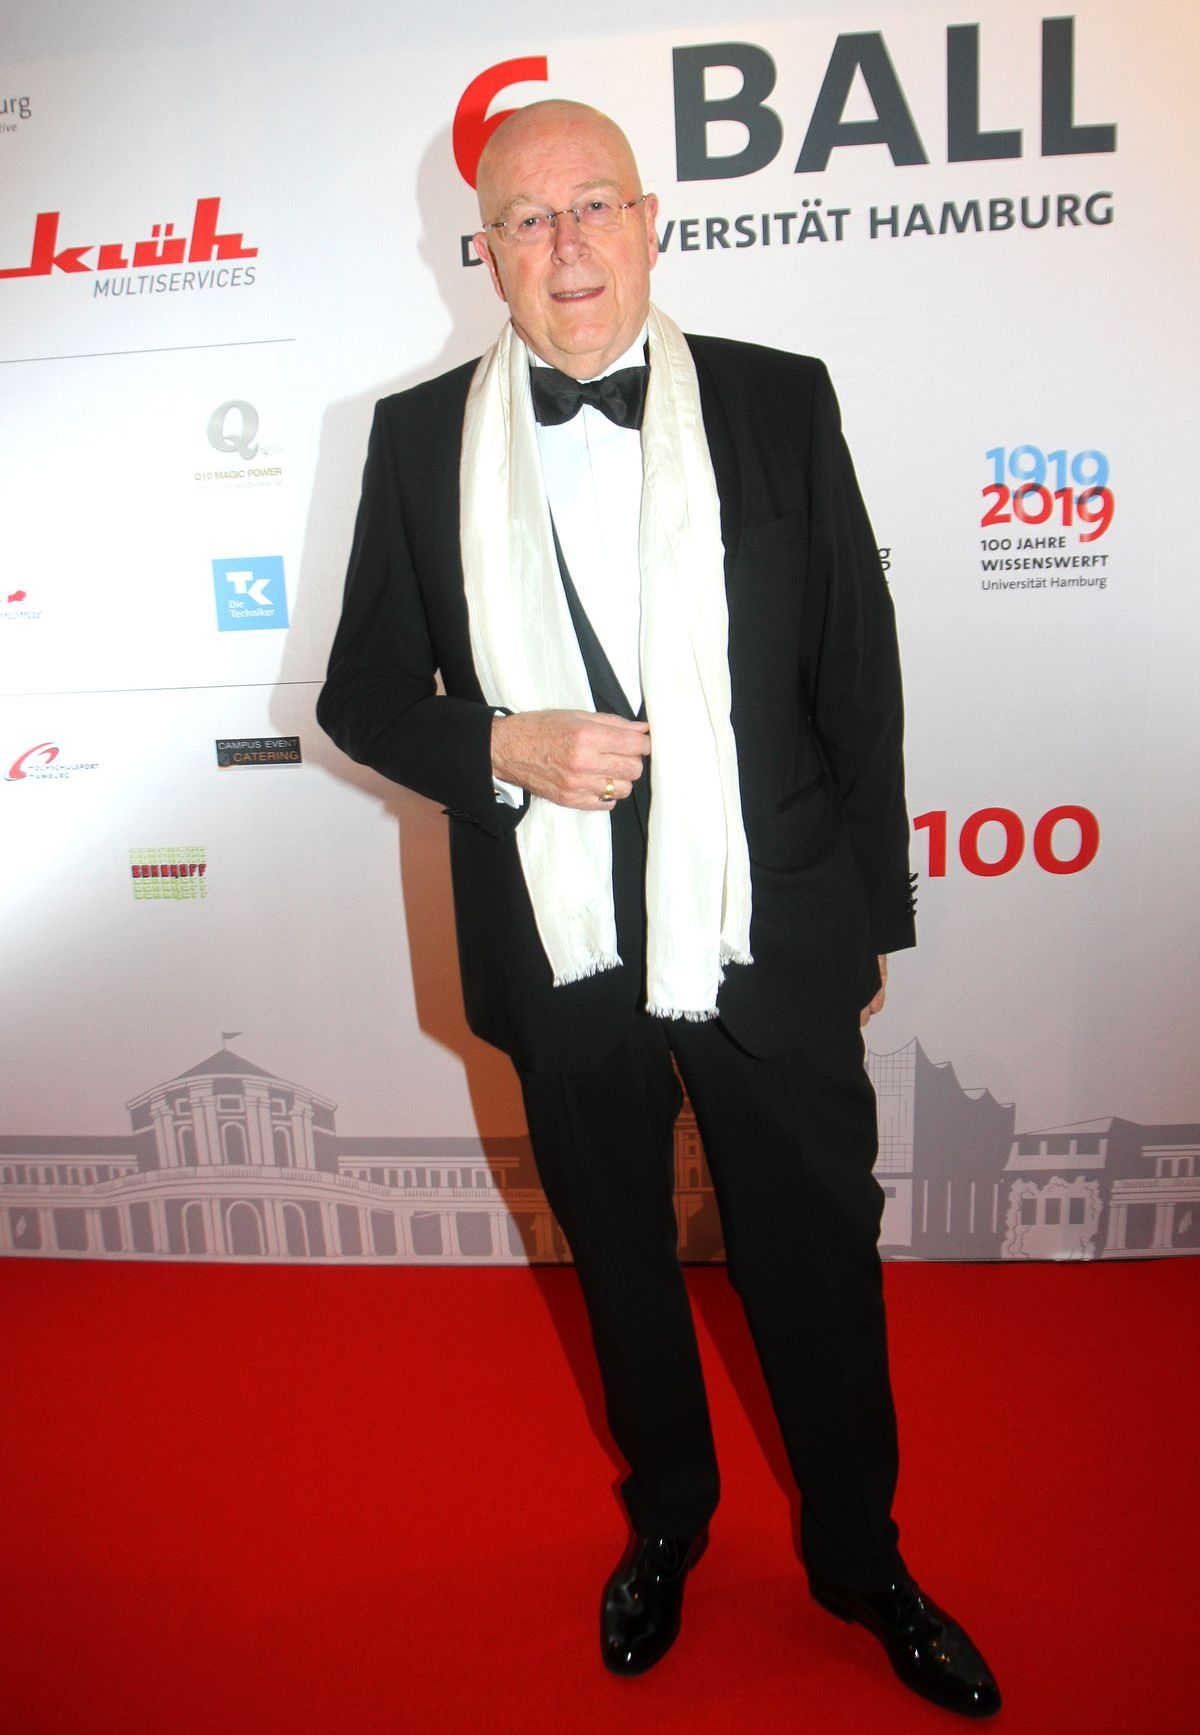 Prof. Dr. Dr. h.c. Dieter Lenzen lädt zum 7. Uniball